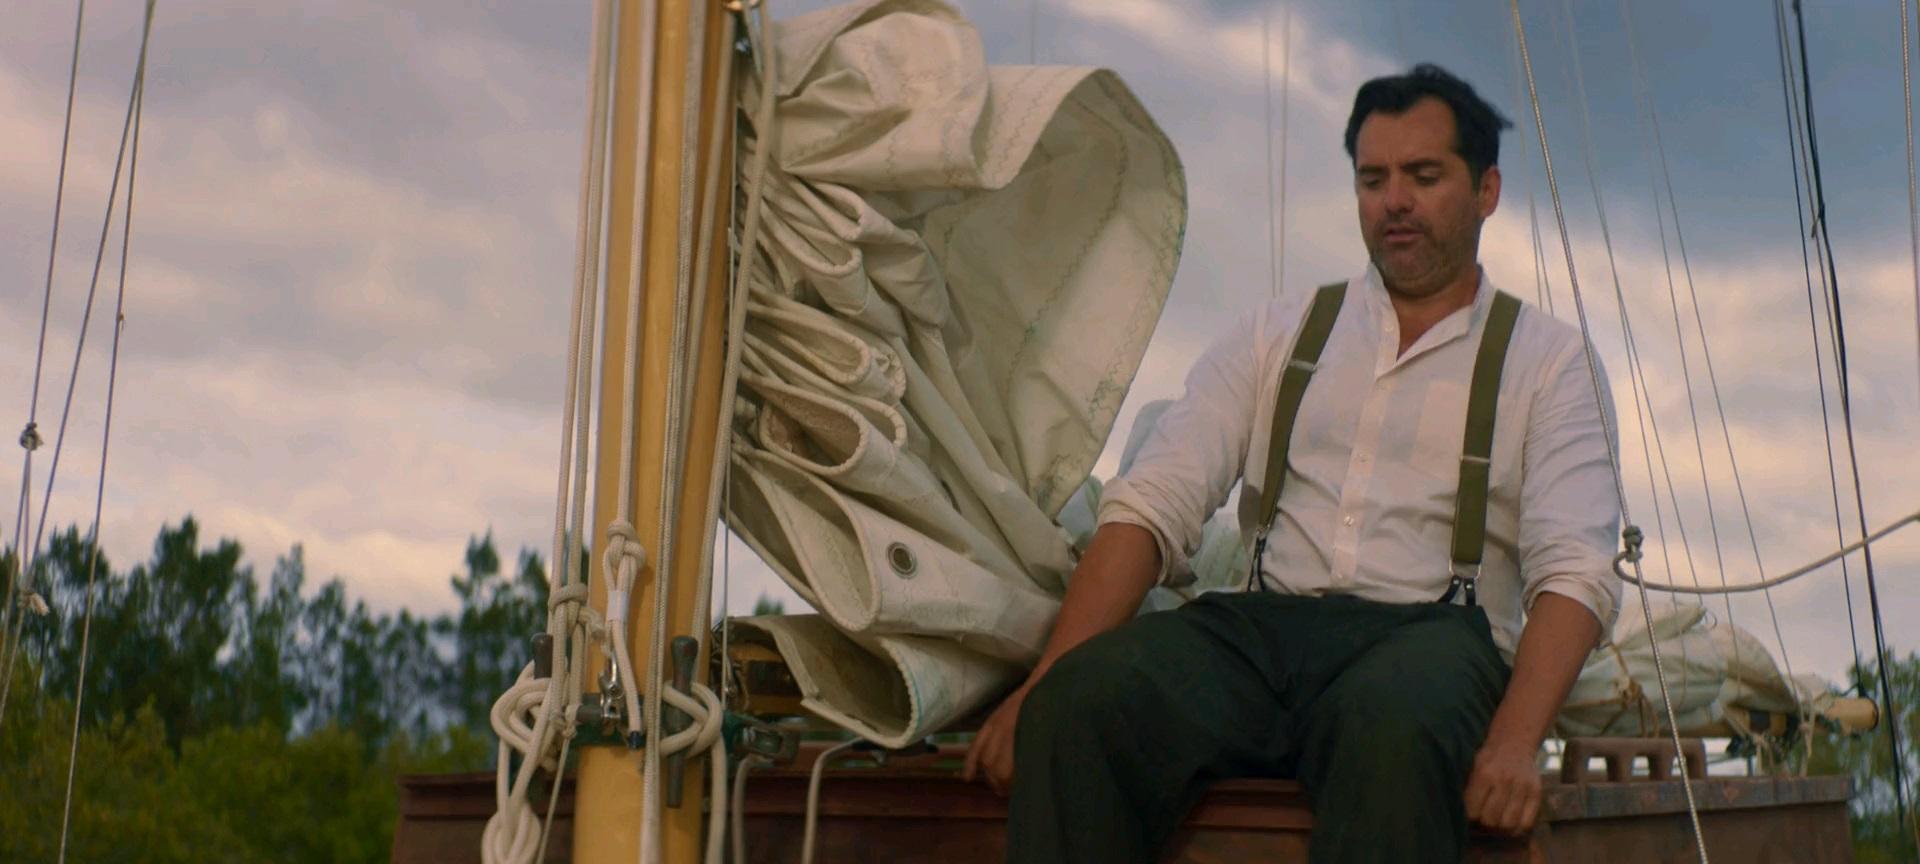 Errol Flynn'in Serüvenleri | In Like Flynn | 2018 | WEB-DL | XviD | Türkçe Dublaj | m720p - m1080p | WEB-DL | Dual | TR-EN | Tek Link